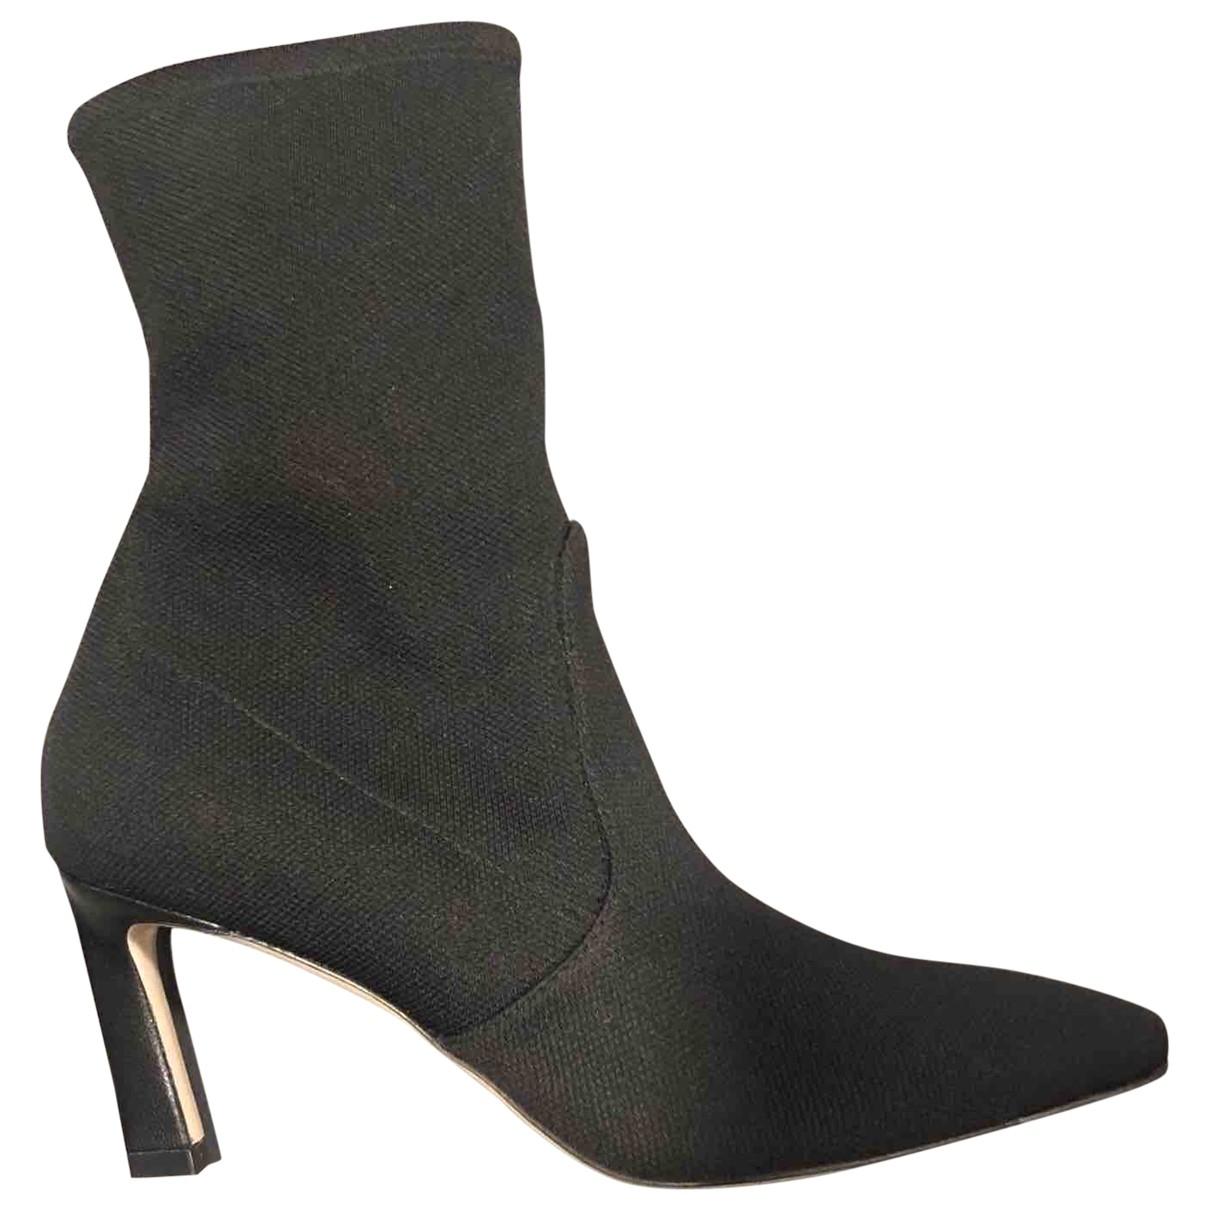 Stuart Weitzman \N Black Cloth Ankle boots for Women 5.5 US